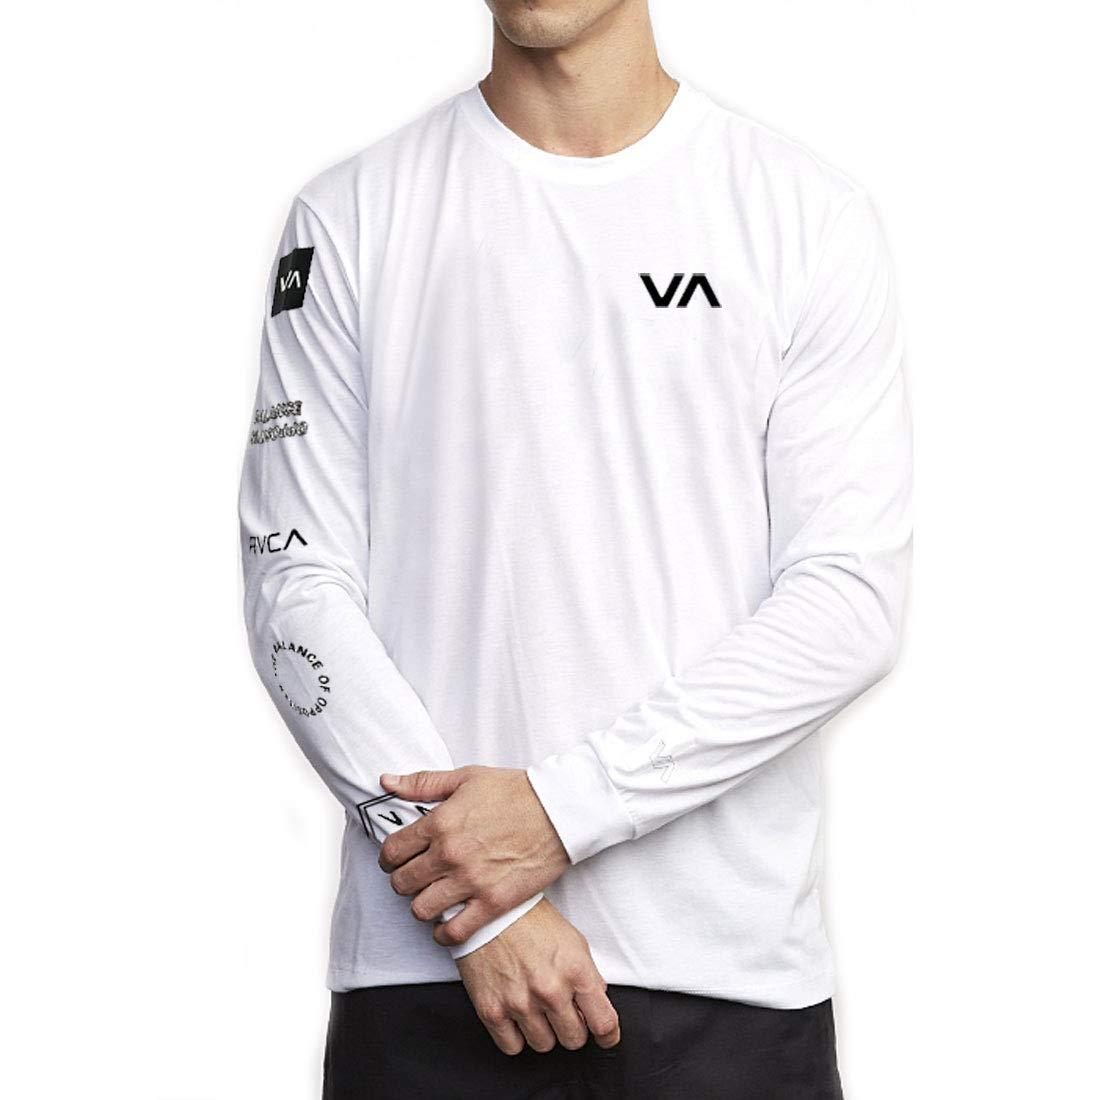 RVCA Mens Long Sleeve Crew Neck T-Shirt